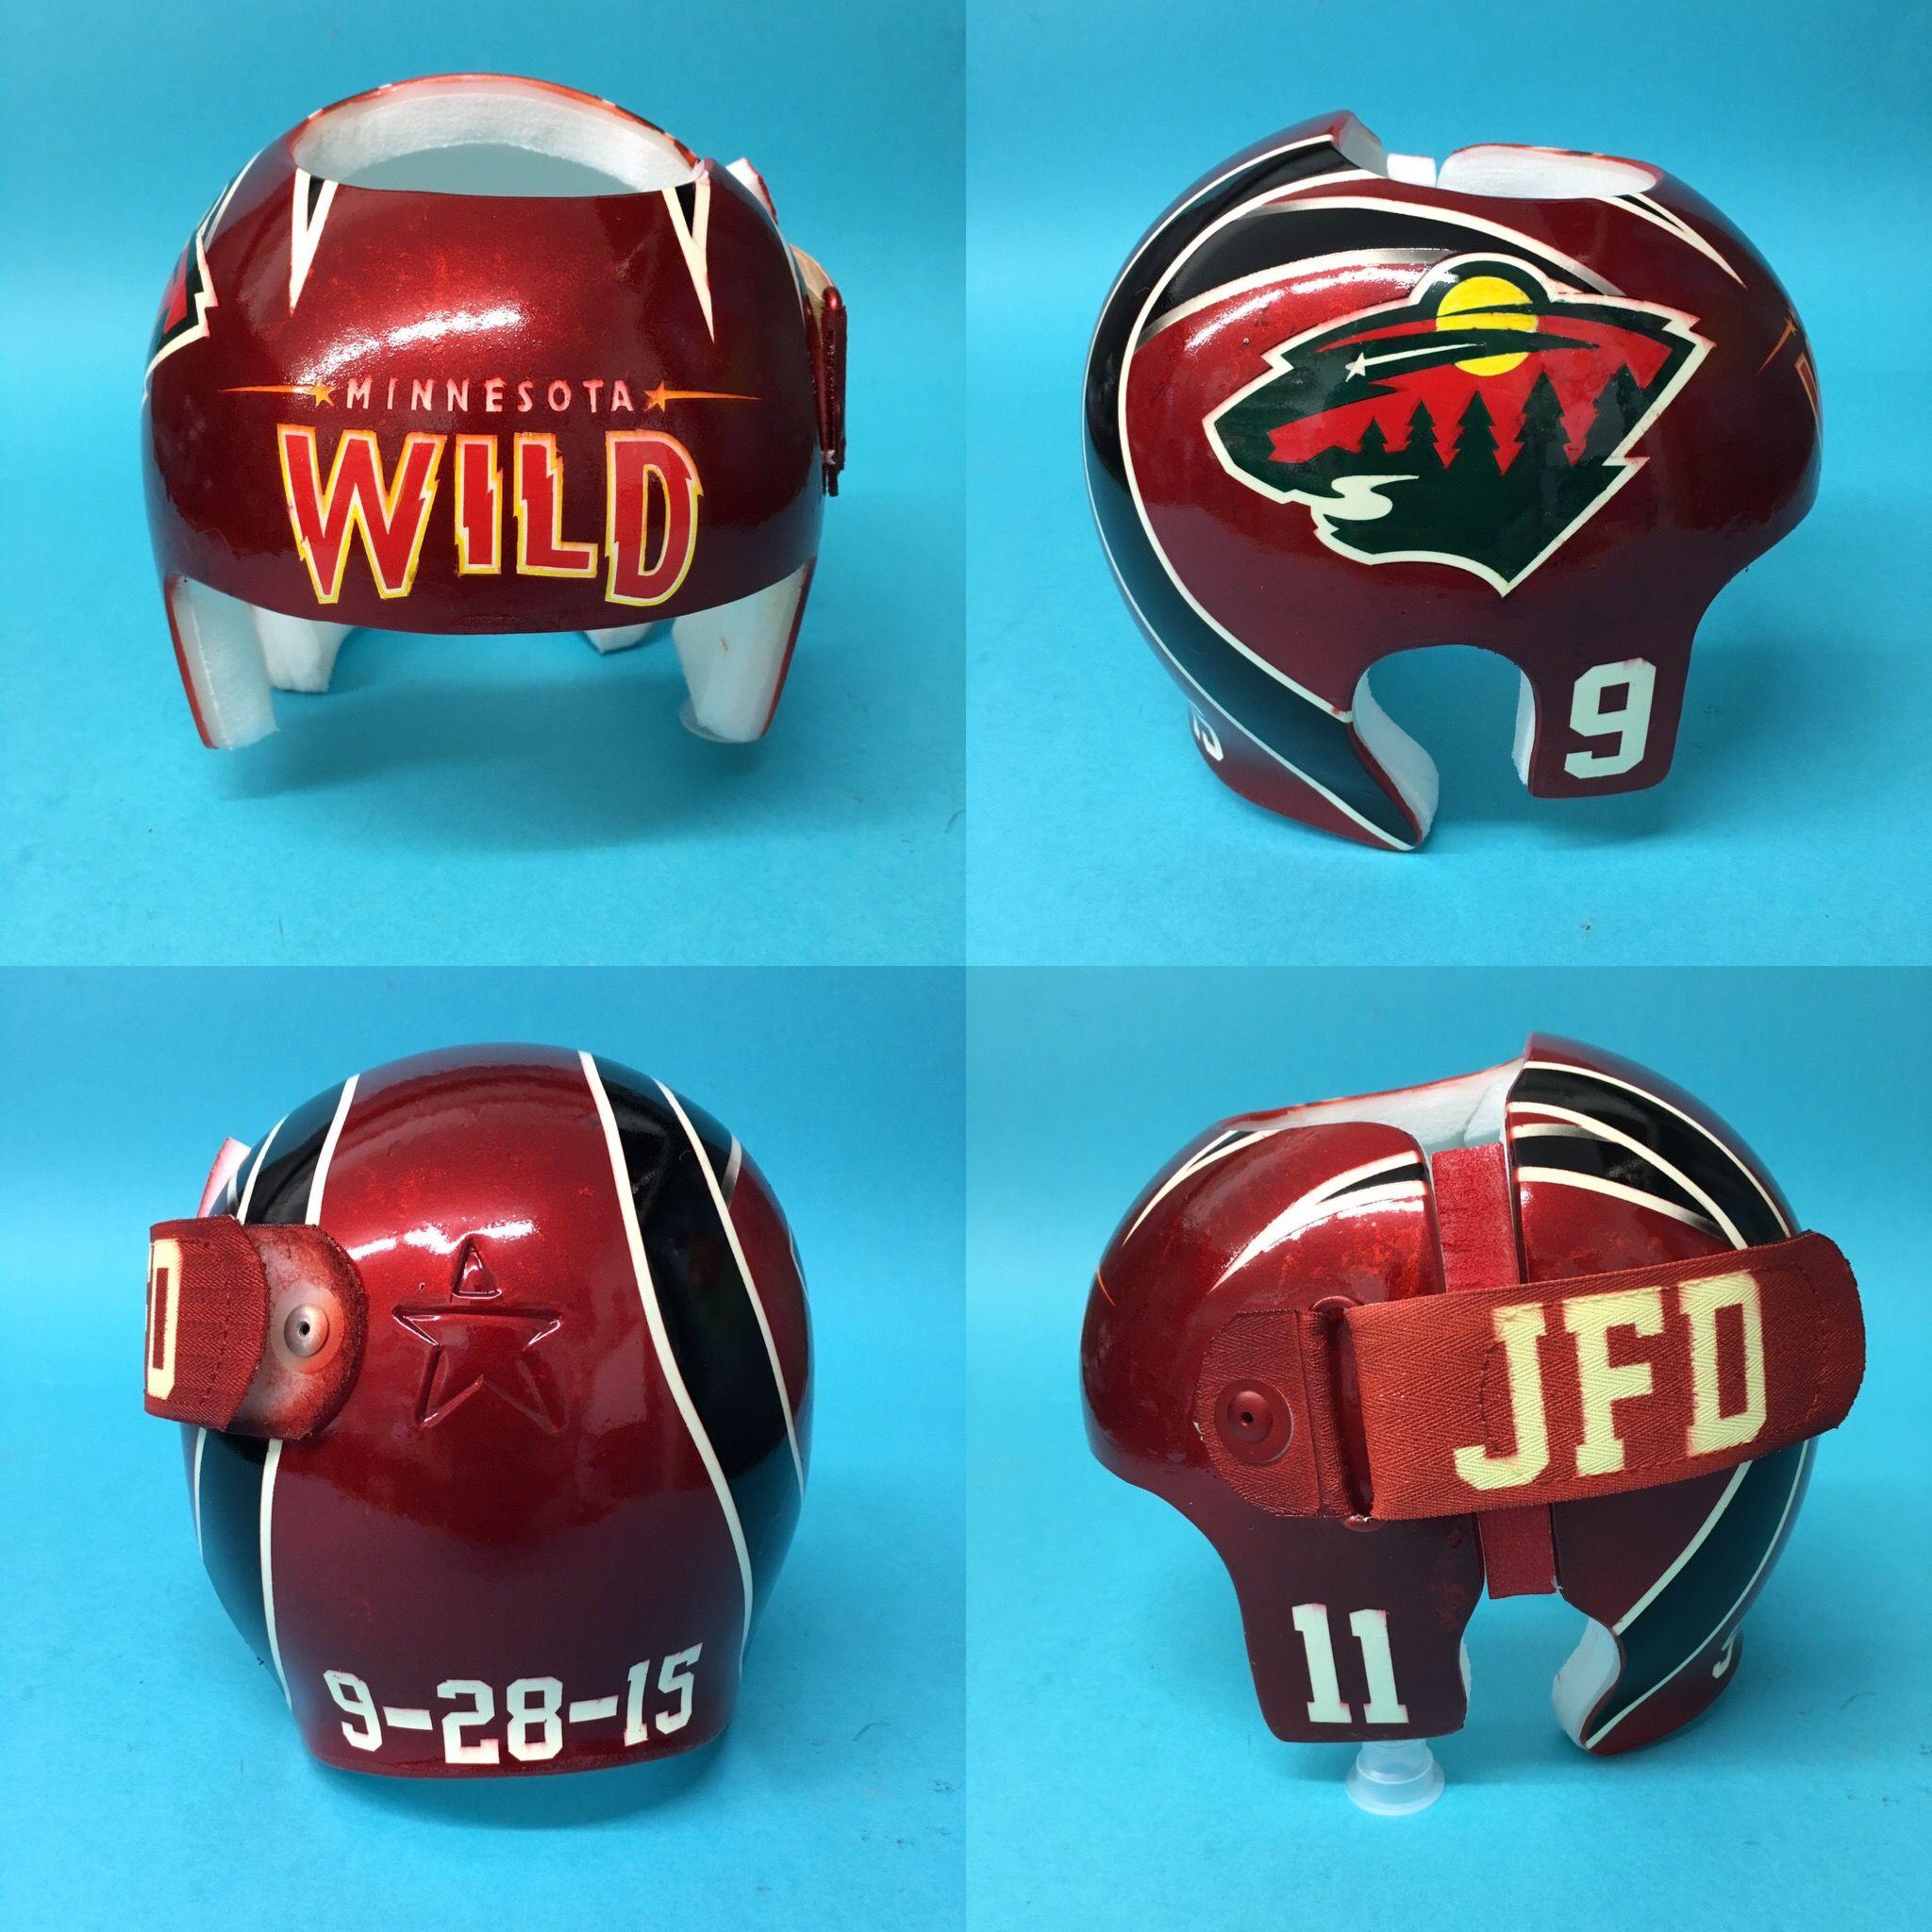 Pin By Mike Hoekstra On Cranial Shaping Helmets Minnesota Wild Piggy Bank Piggy